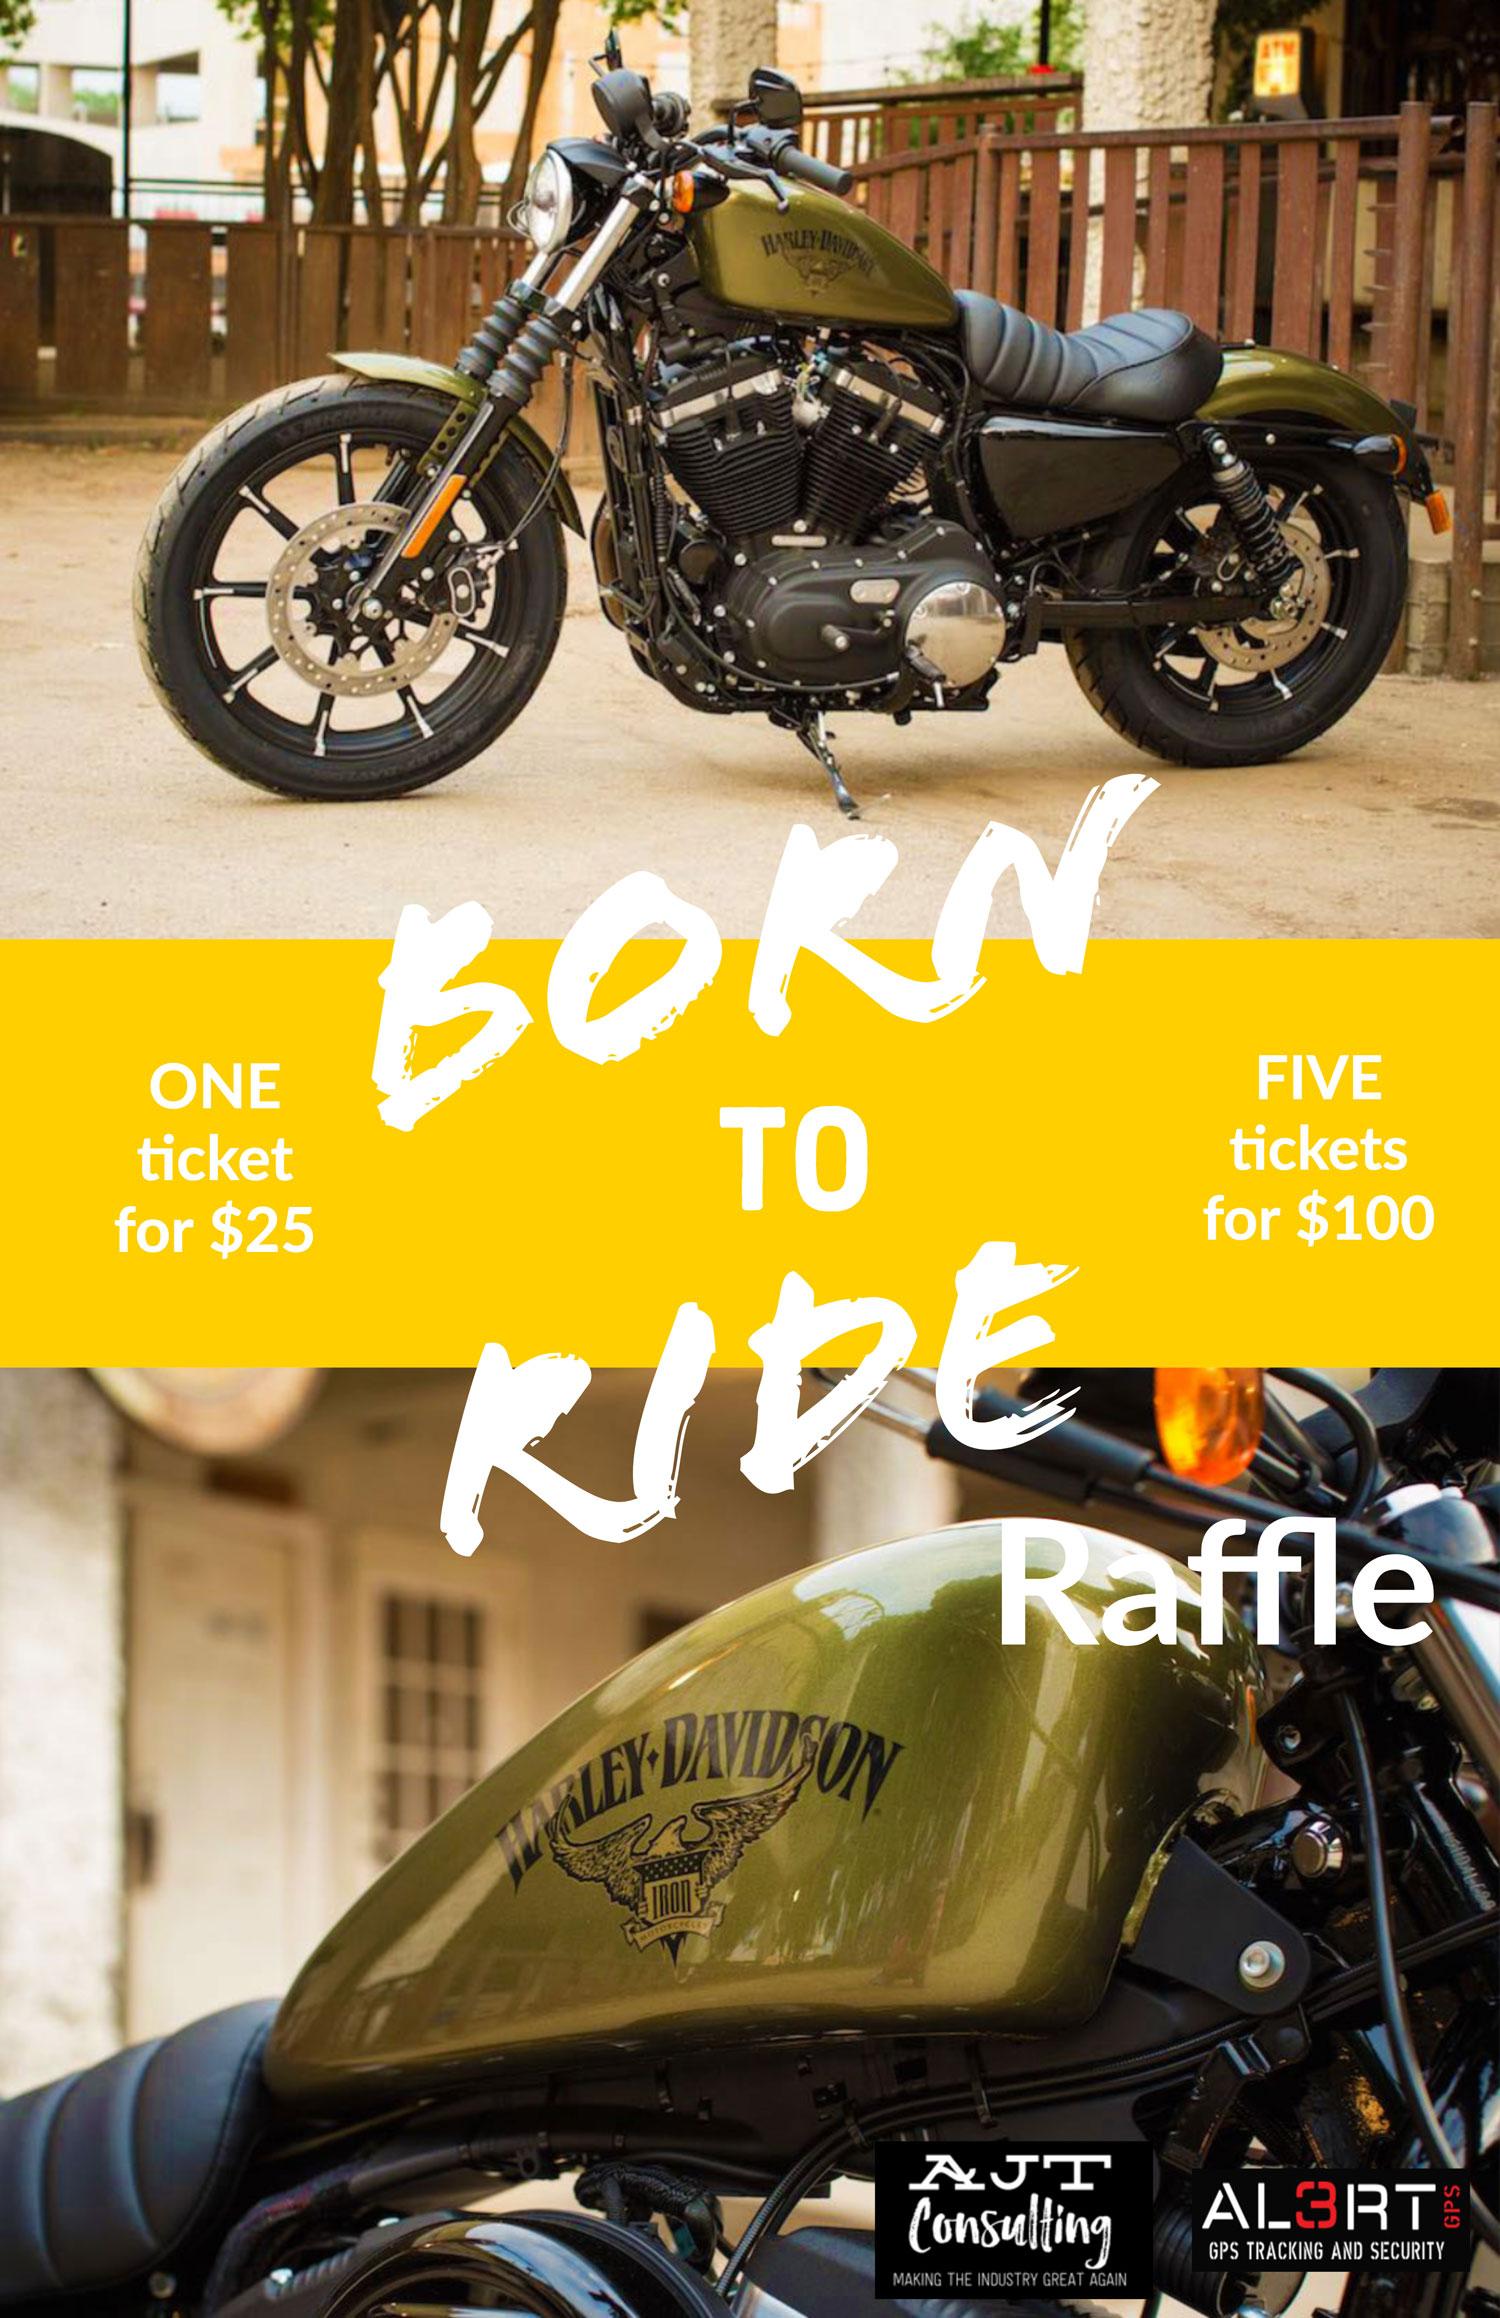 2019-YRG-Raffle-Harley-left-1500x2318.jpg